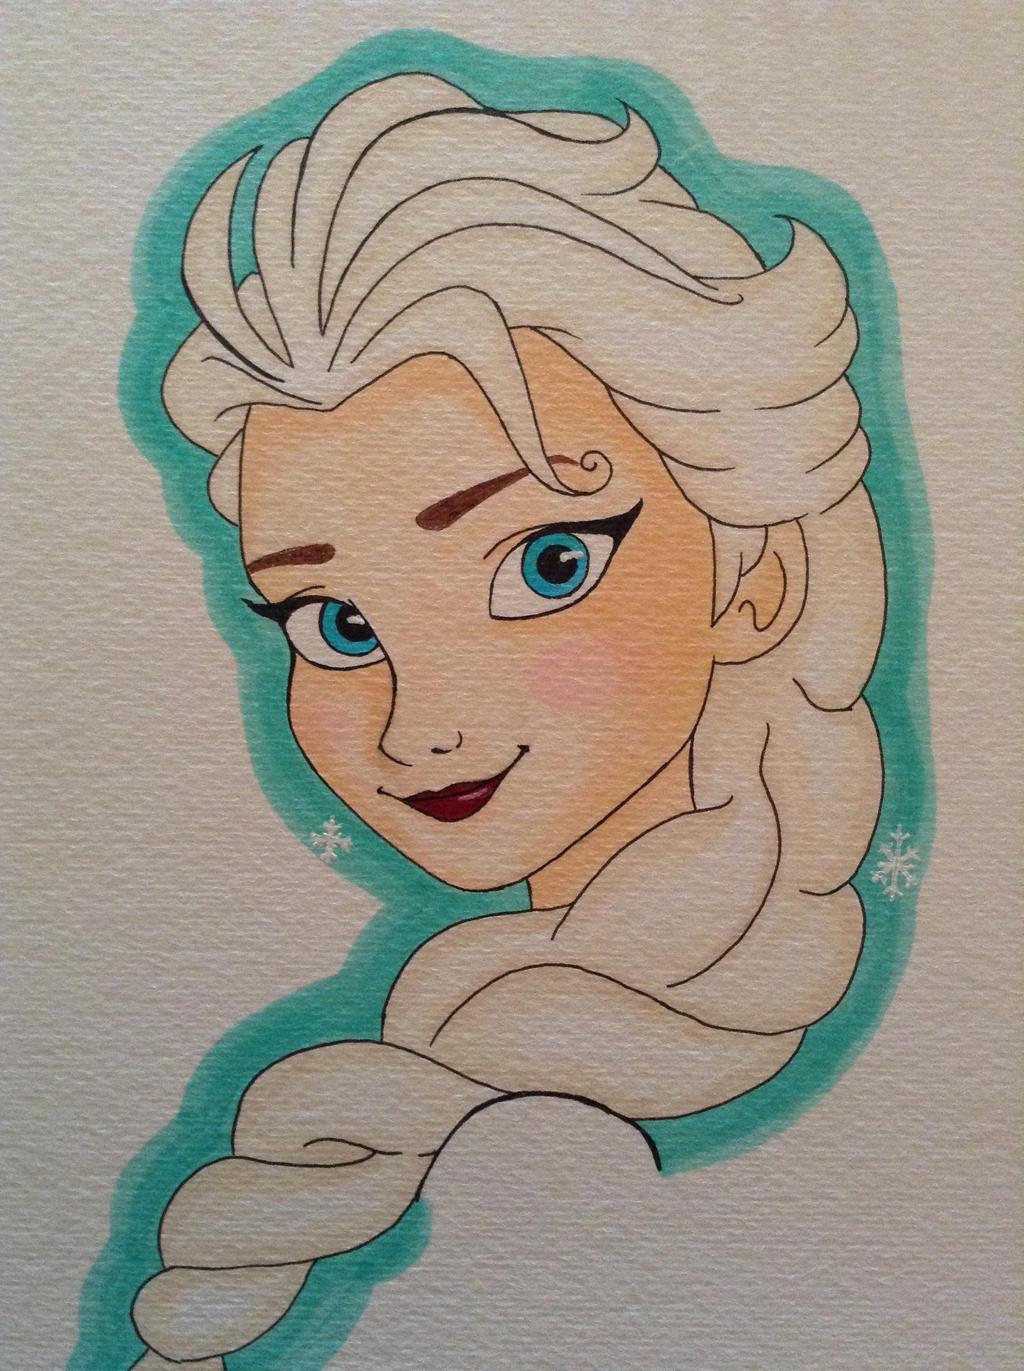 My Elsa work in progress by Greatlygeeky